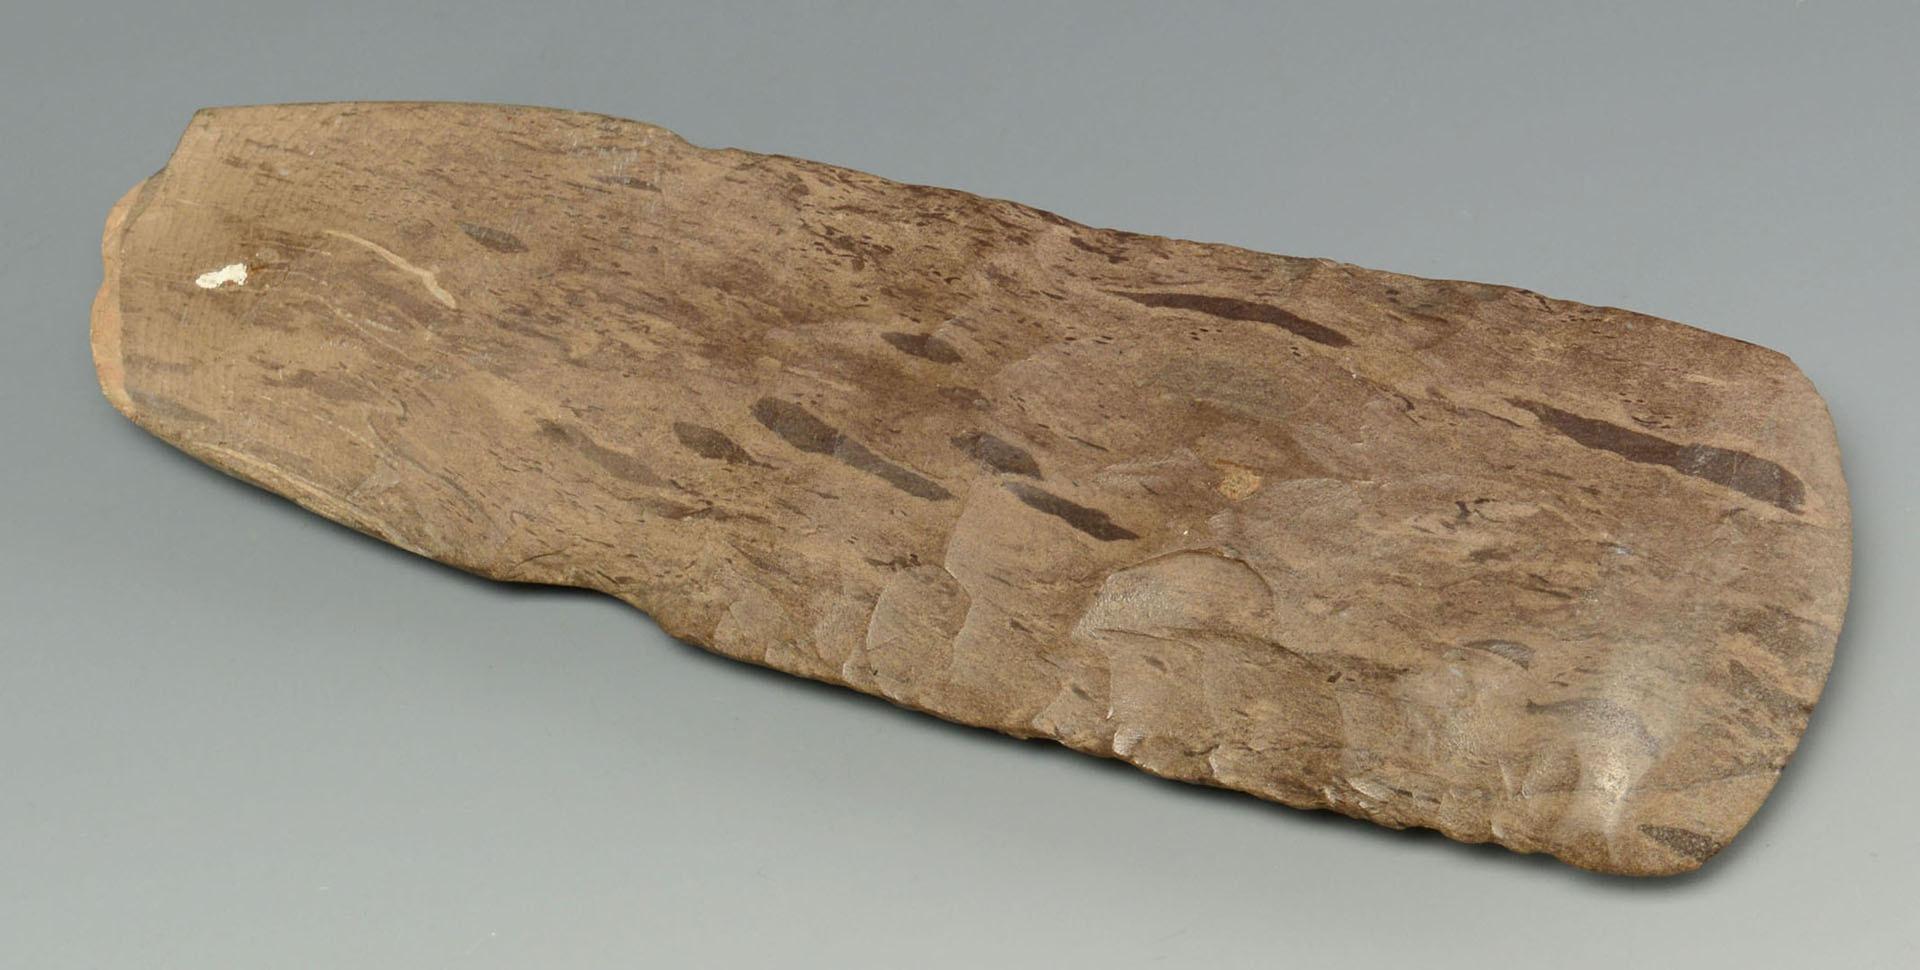 Lot 636: 2 Dover flint celts and 1 spatulate celt, TN